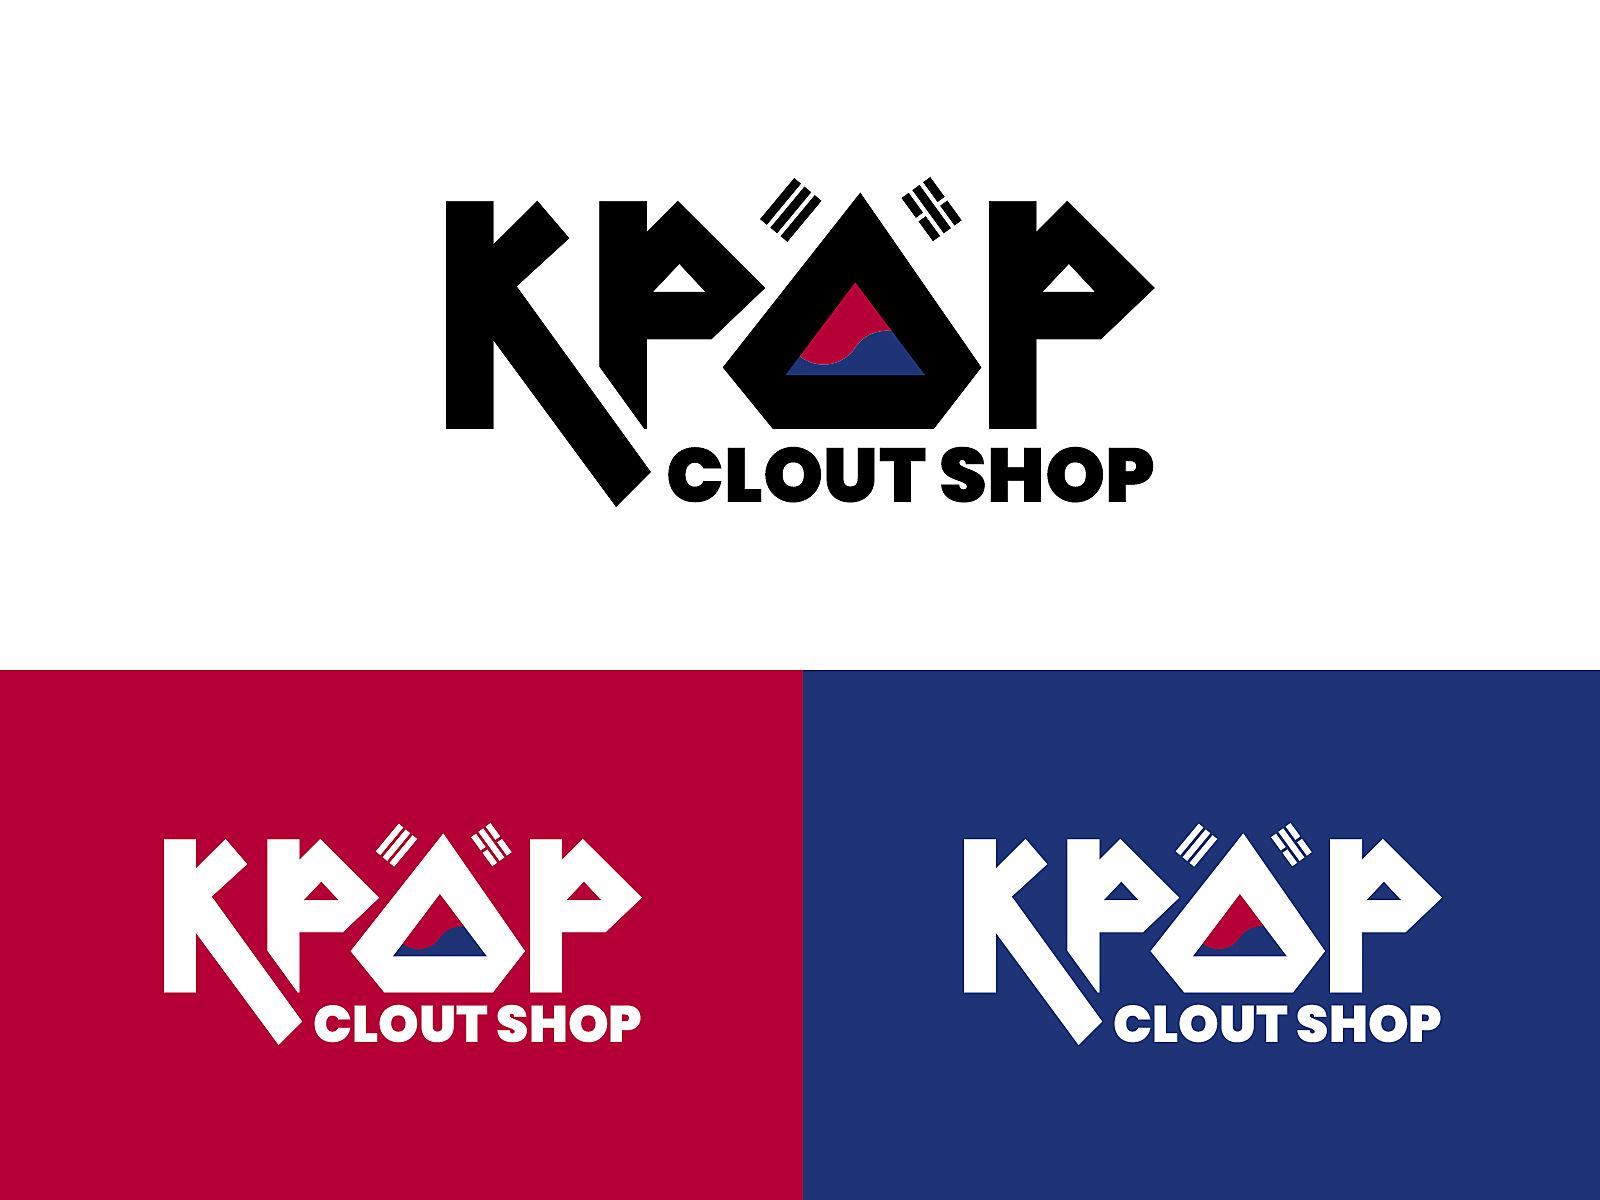 Kpop Clout Shop Logo Design by Deziner Guys on Dribbble.